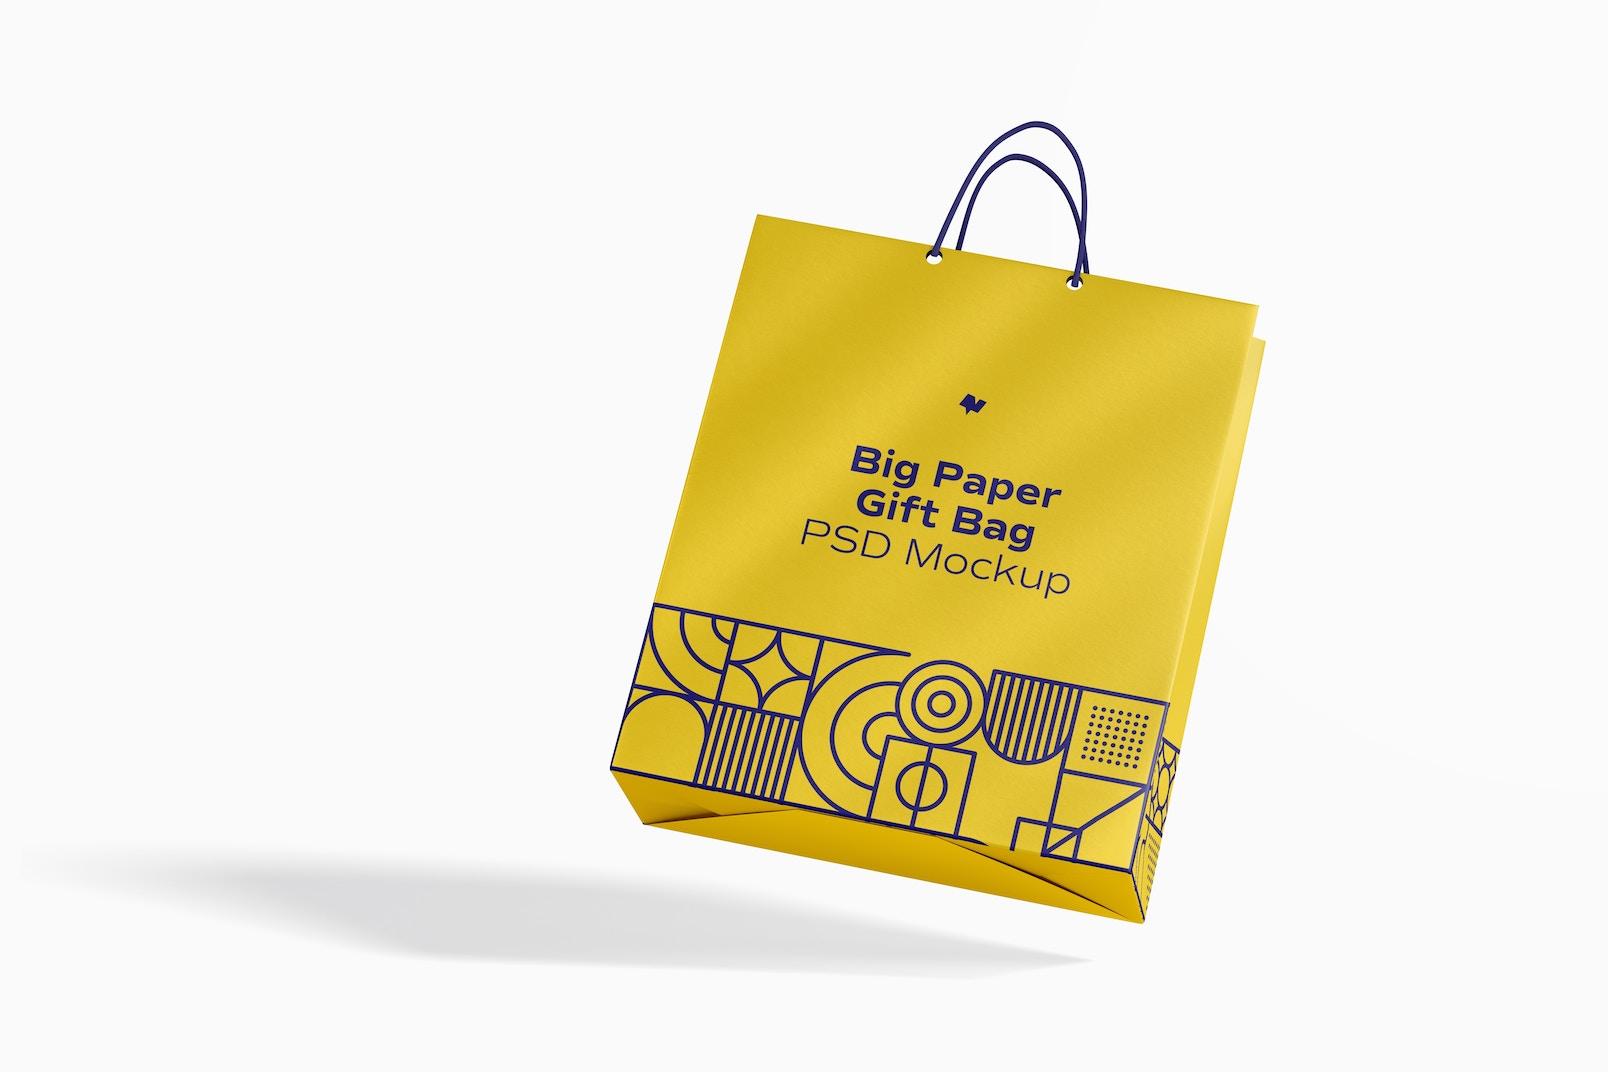 Big Paper Gift Bag With Rope Handle Mockup, Falling